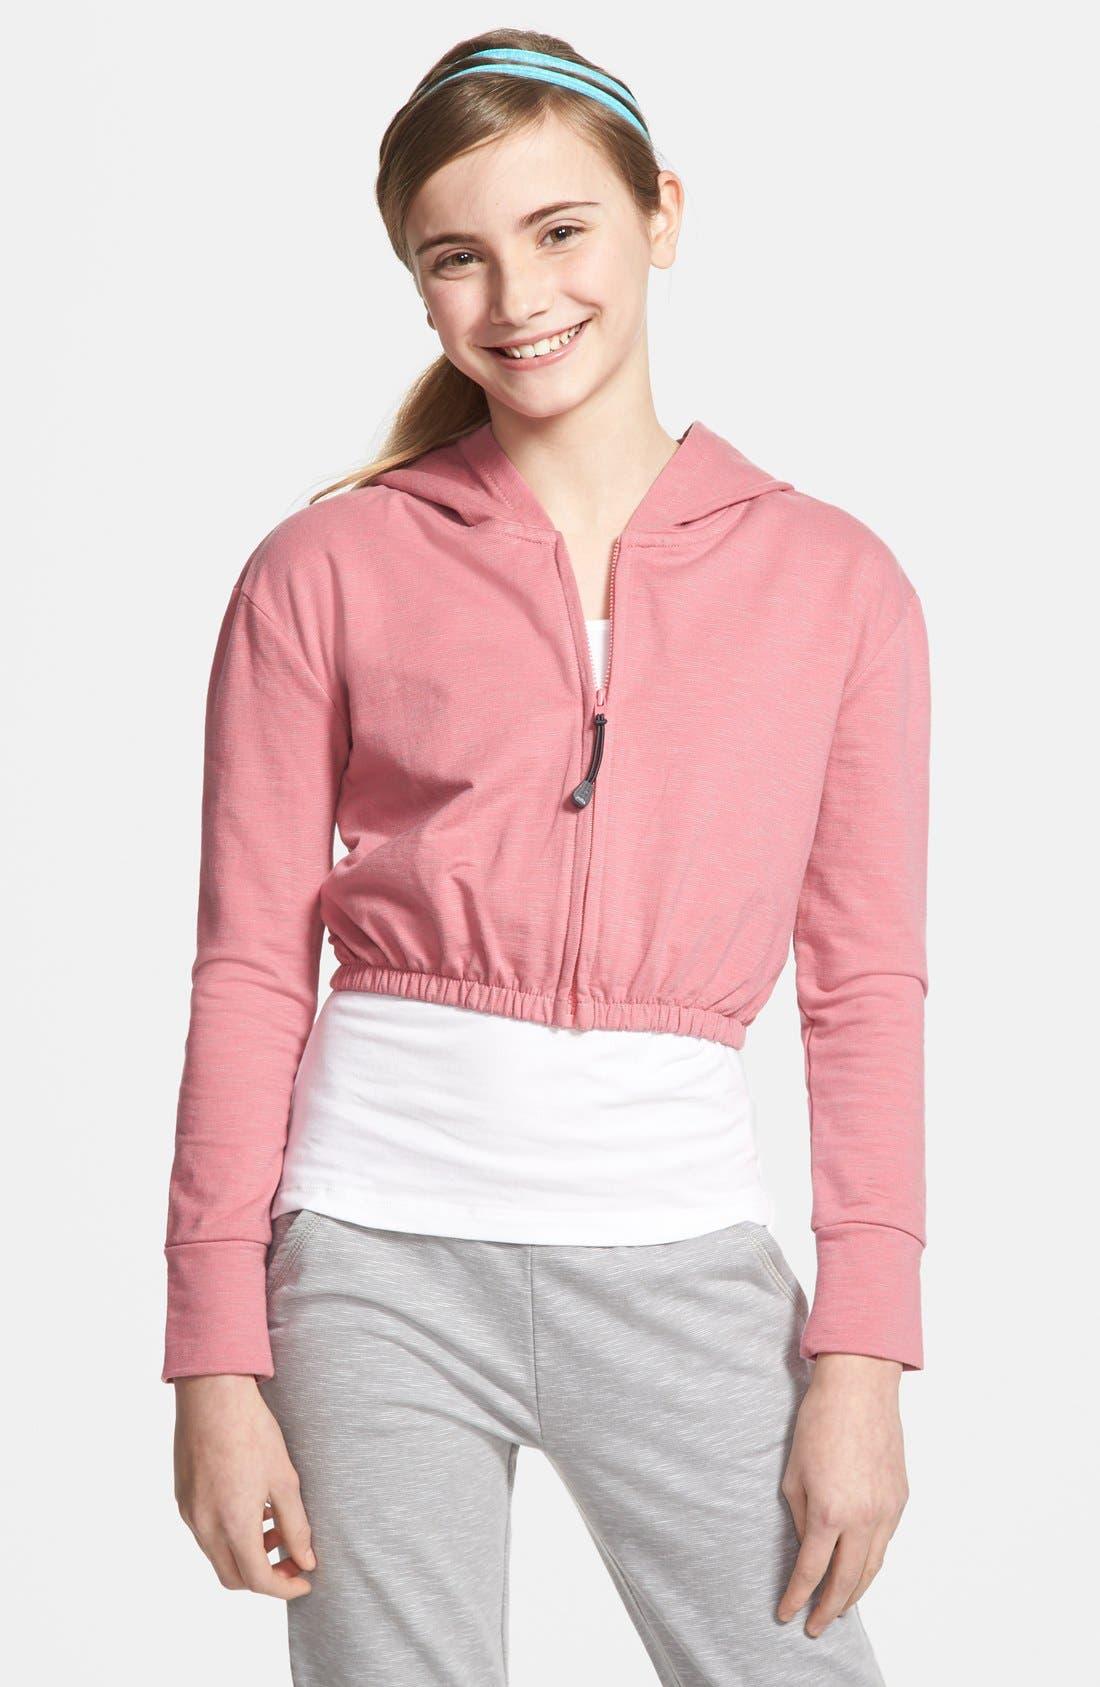 Alternate Image 1 Selected - Zella 'Escape' Sweatshirt (Little Girls & Big Girls)